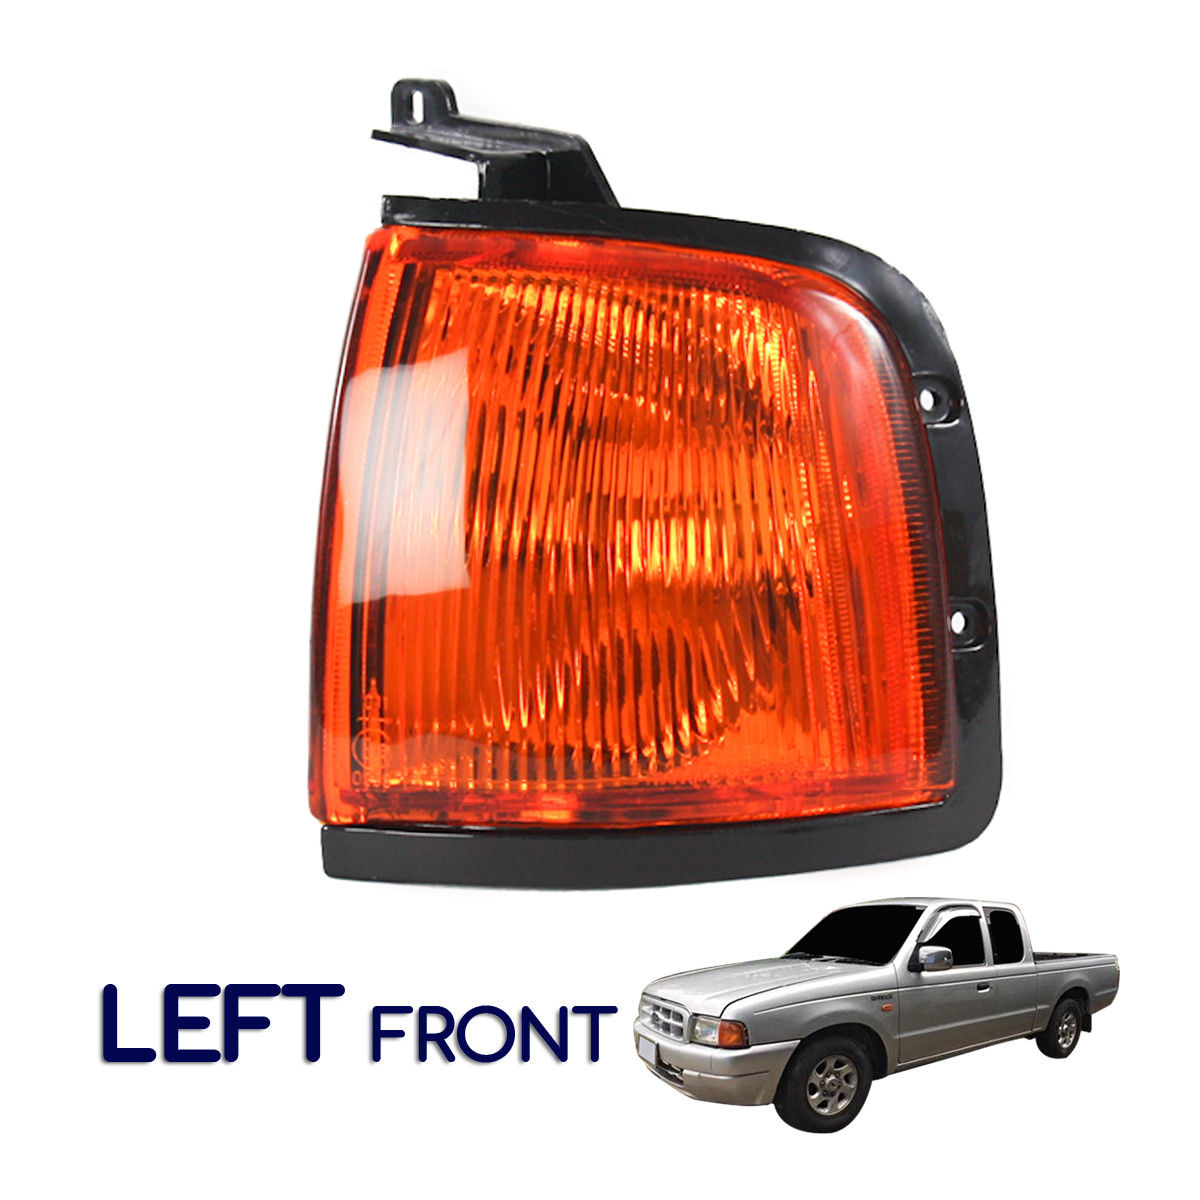 USコーナーライト Corner Lights Turn Indicator Lamp Left Fits Ford Ranger Pickup Truck 1999-2002 コーナーライトターンインジケーターランプ左Ford Ranger Pickup Truck 1999-2002